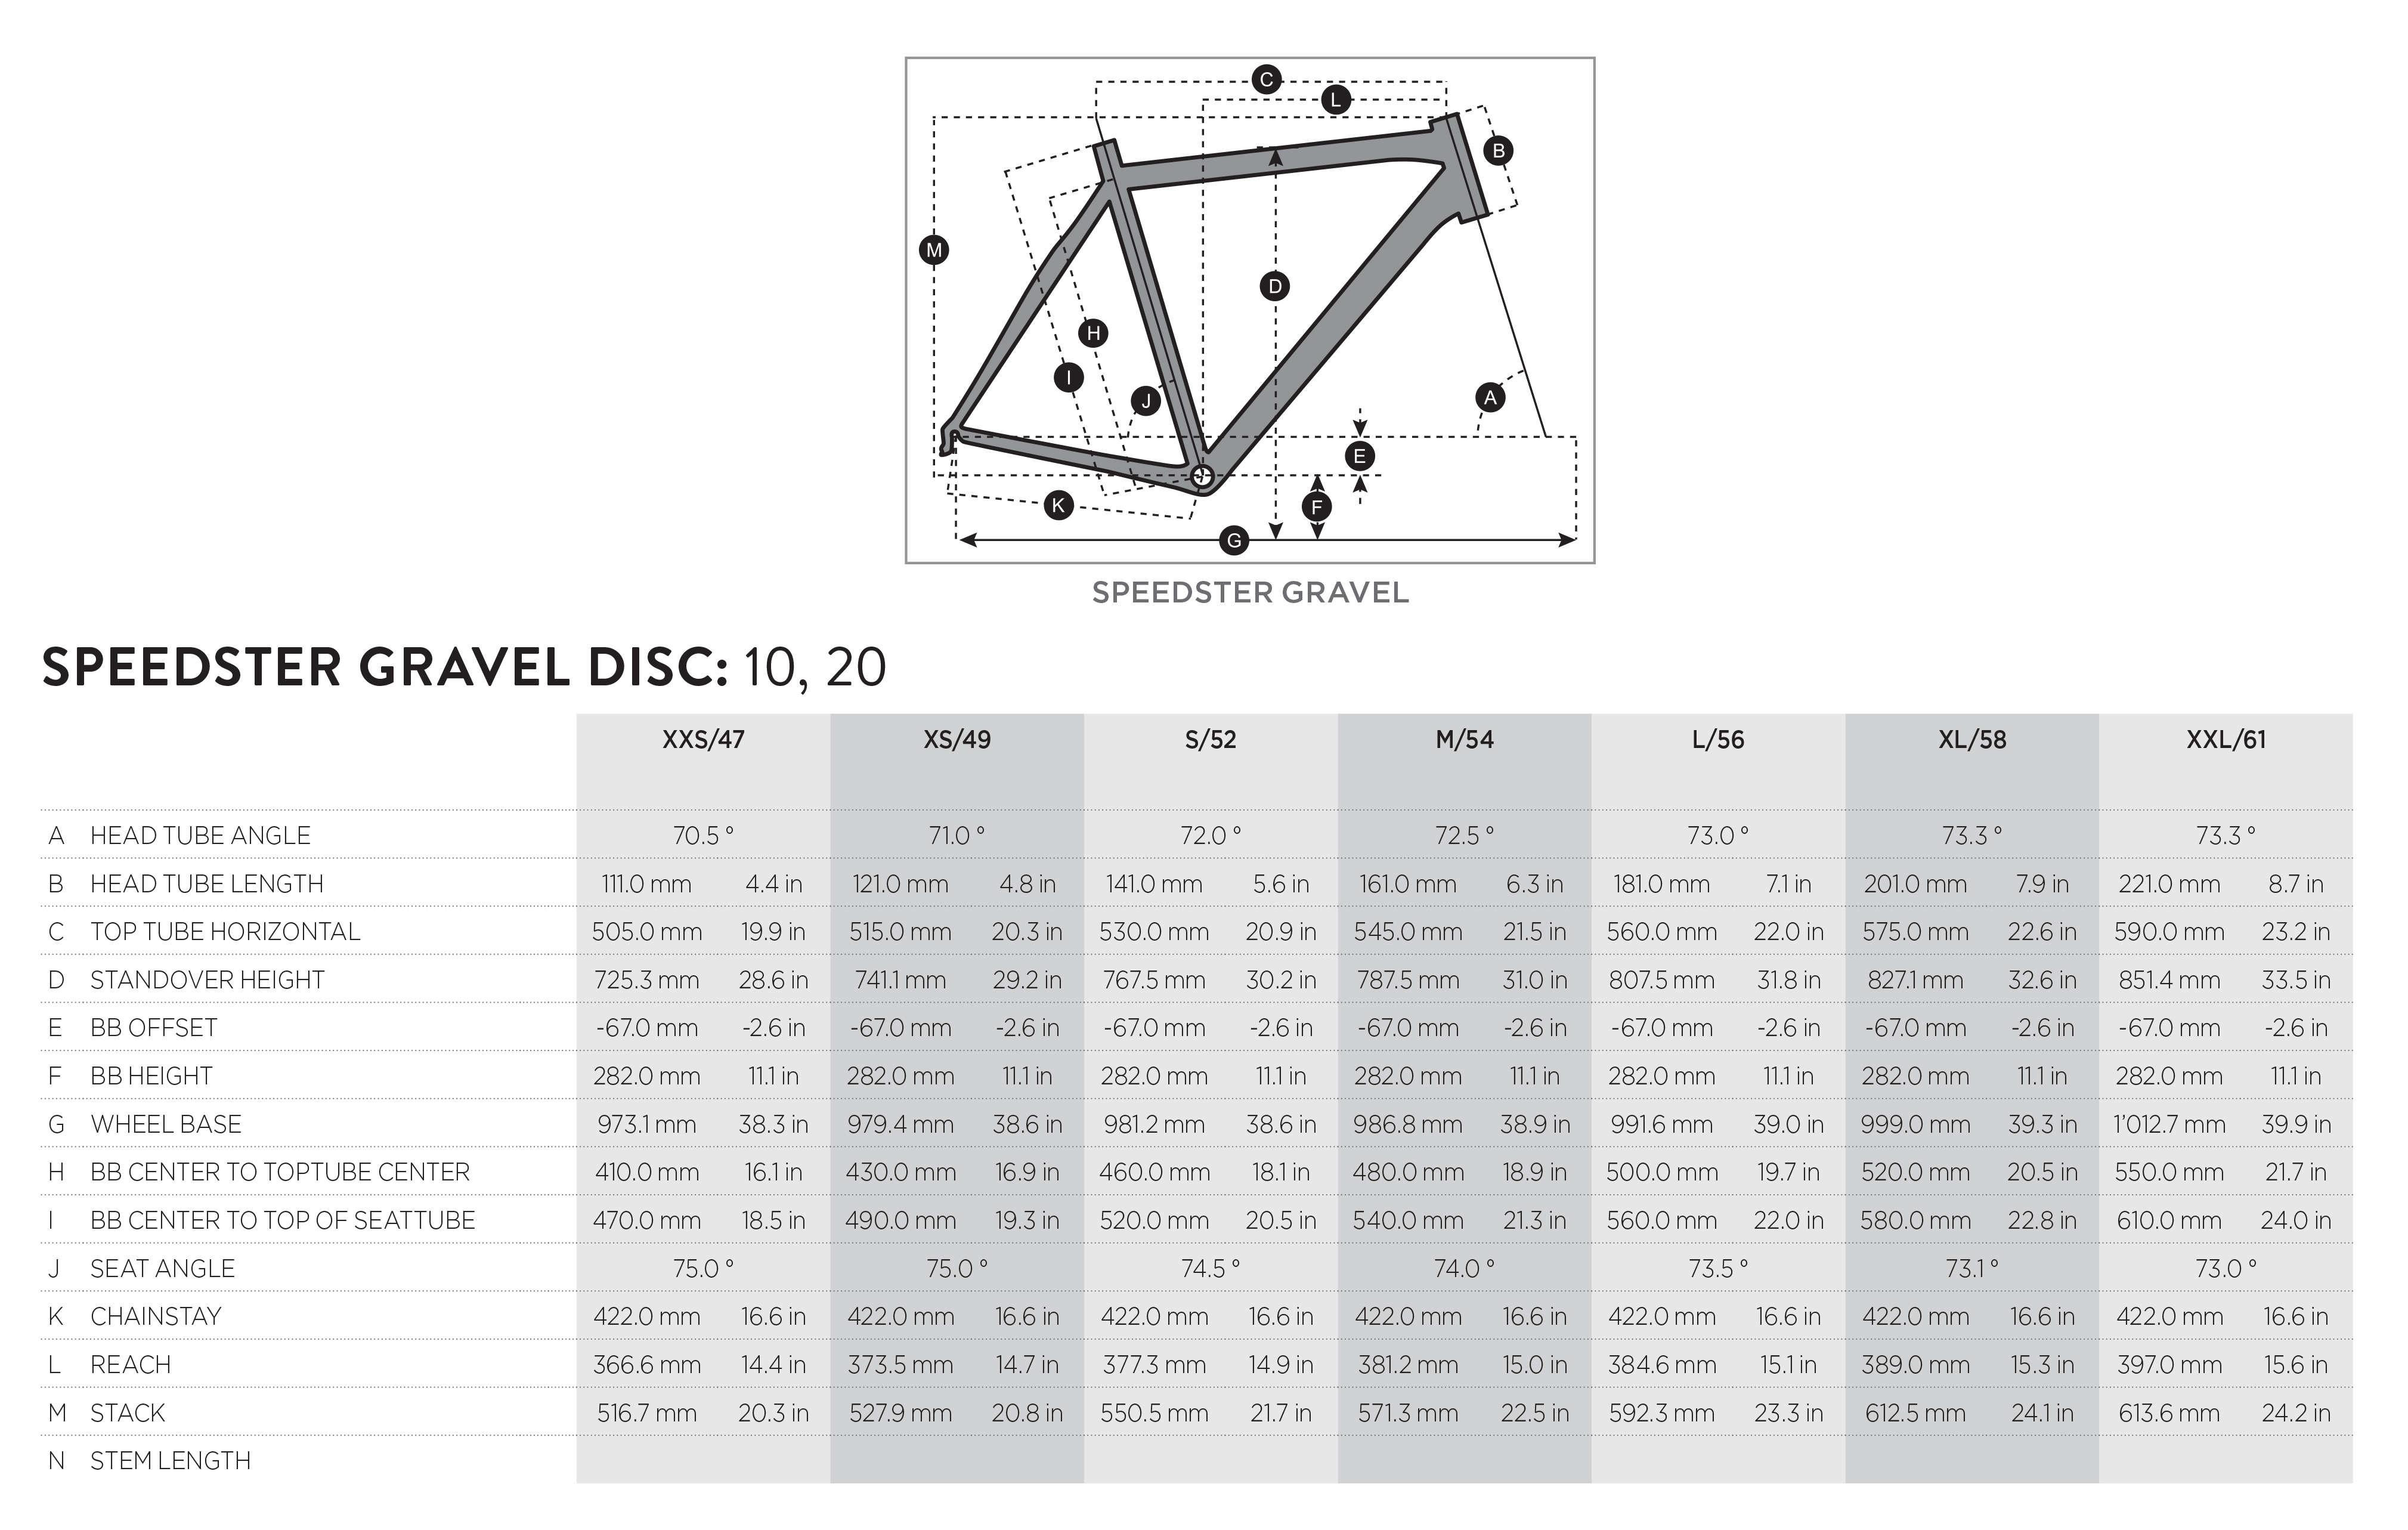 Scott Speedster Gravel 10 Disc geometry chart